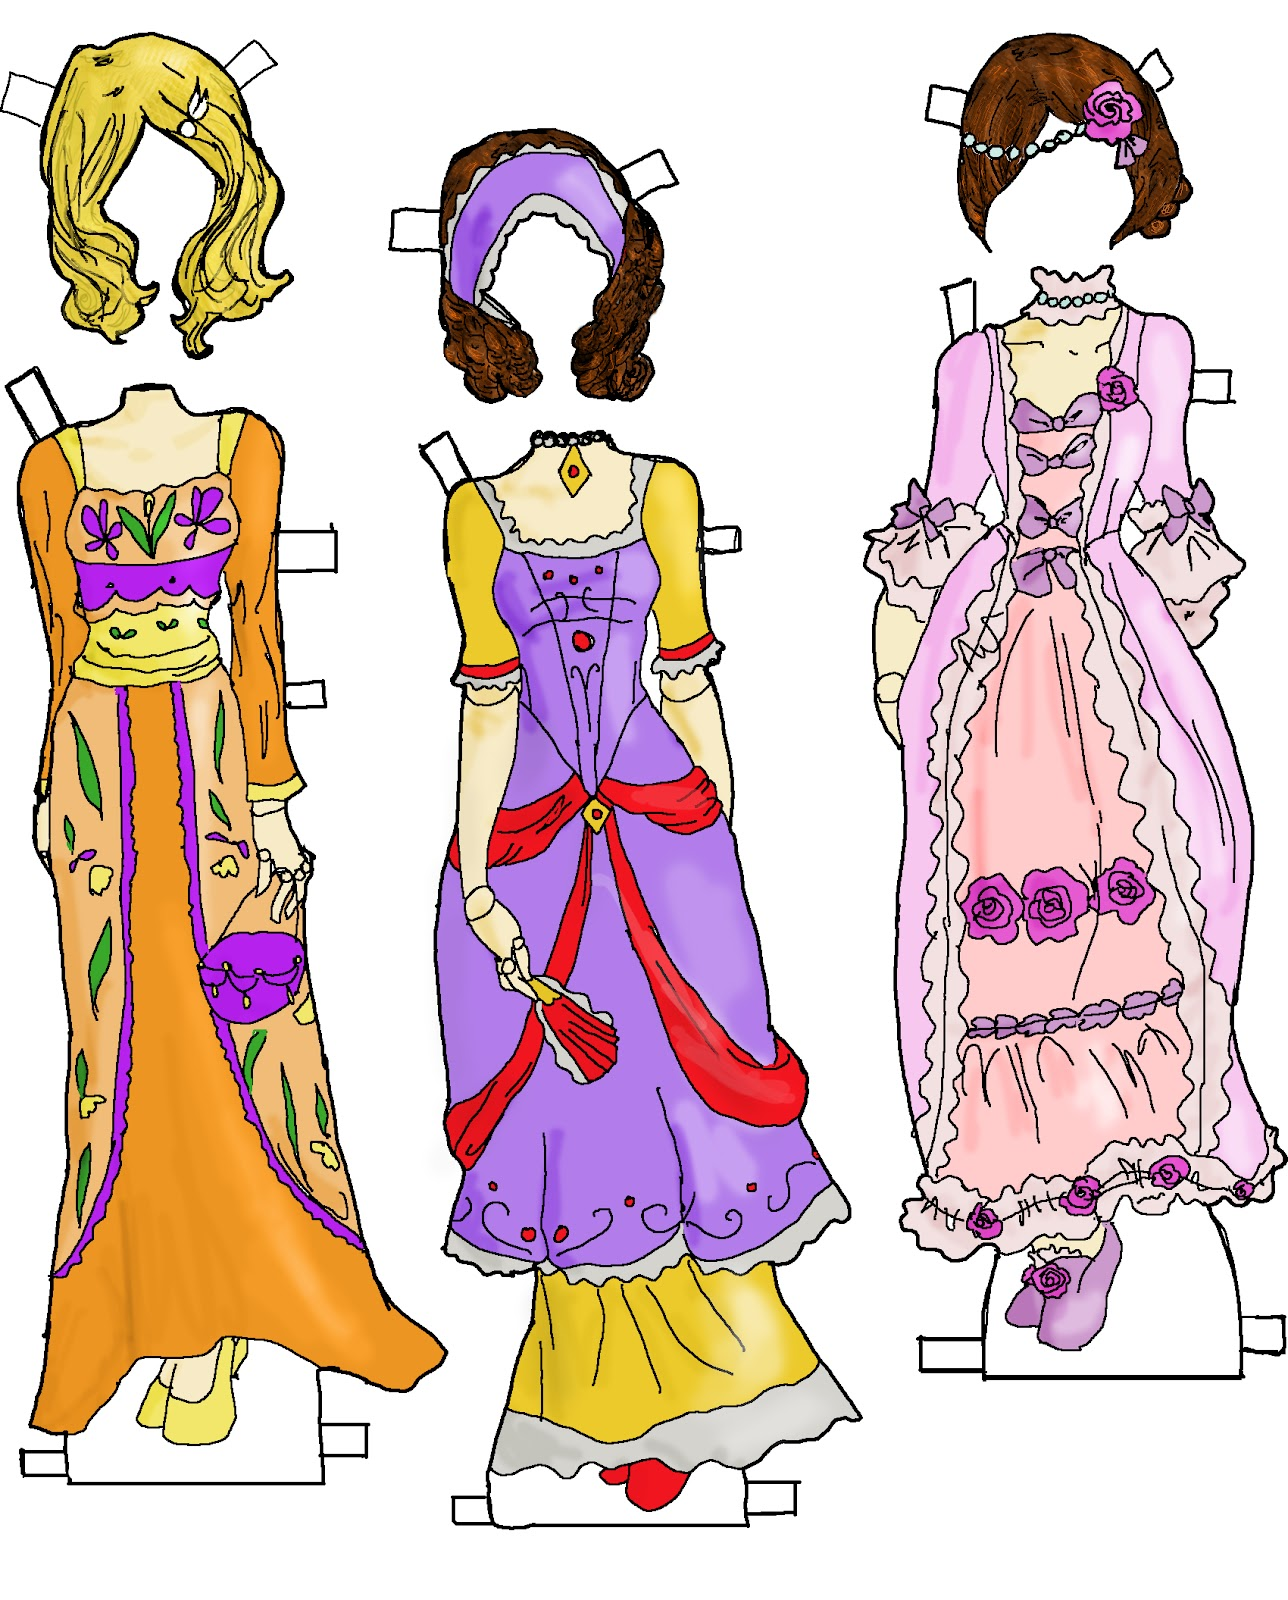 http://3.bp.blogspot.com/-XmkNFW9JNus/T8Jw0asYXKI/AAAAAAAAAq8/ubNqLl3uAIA/s1600/dresscolor4.jpg